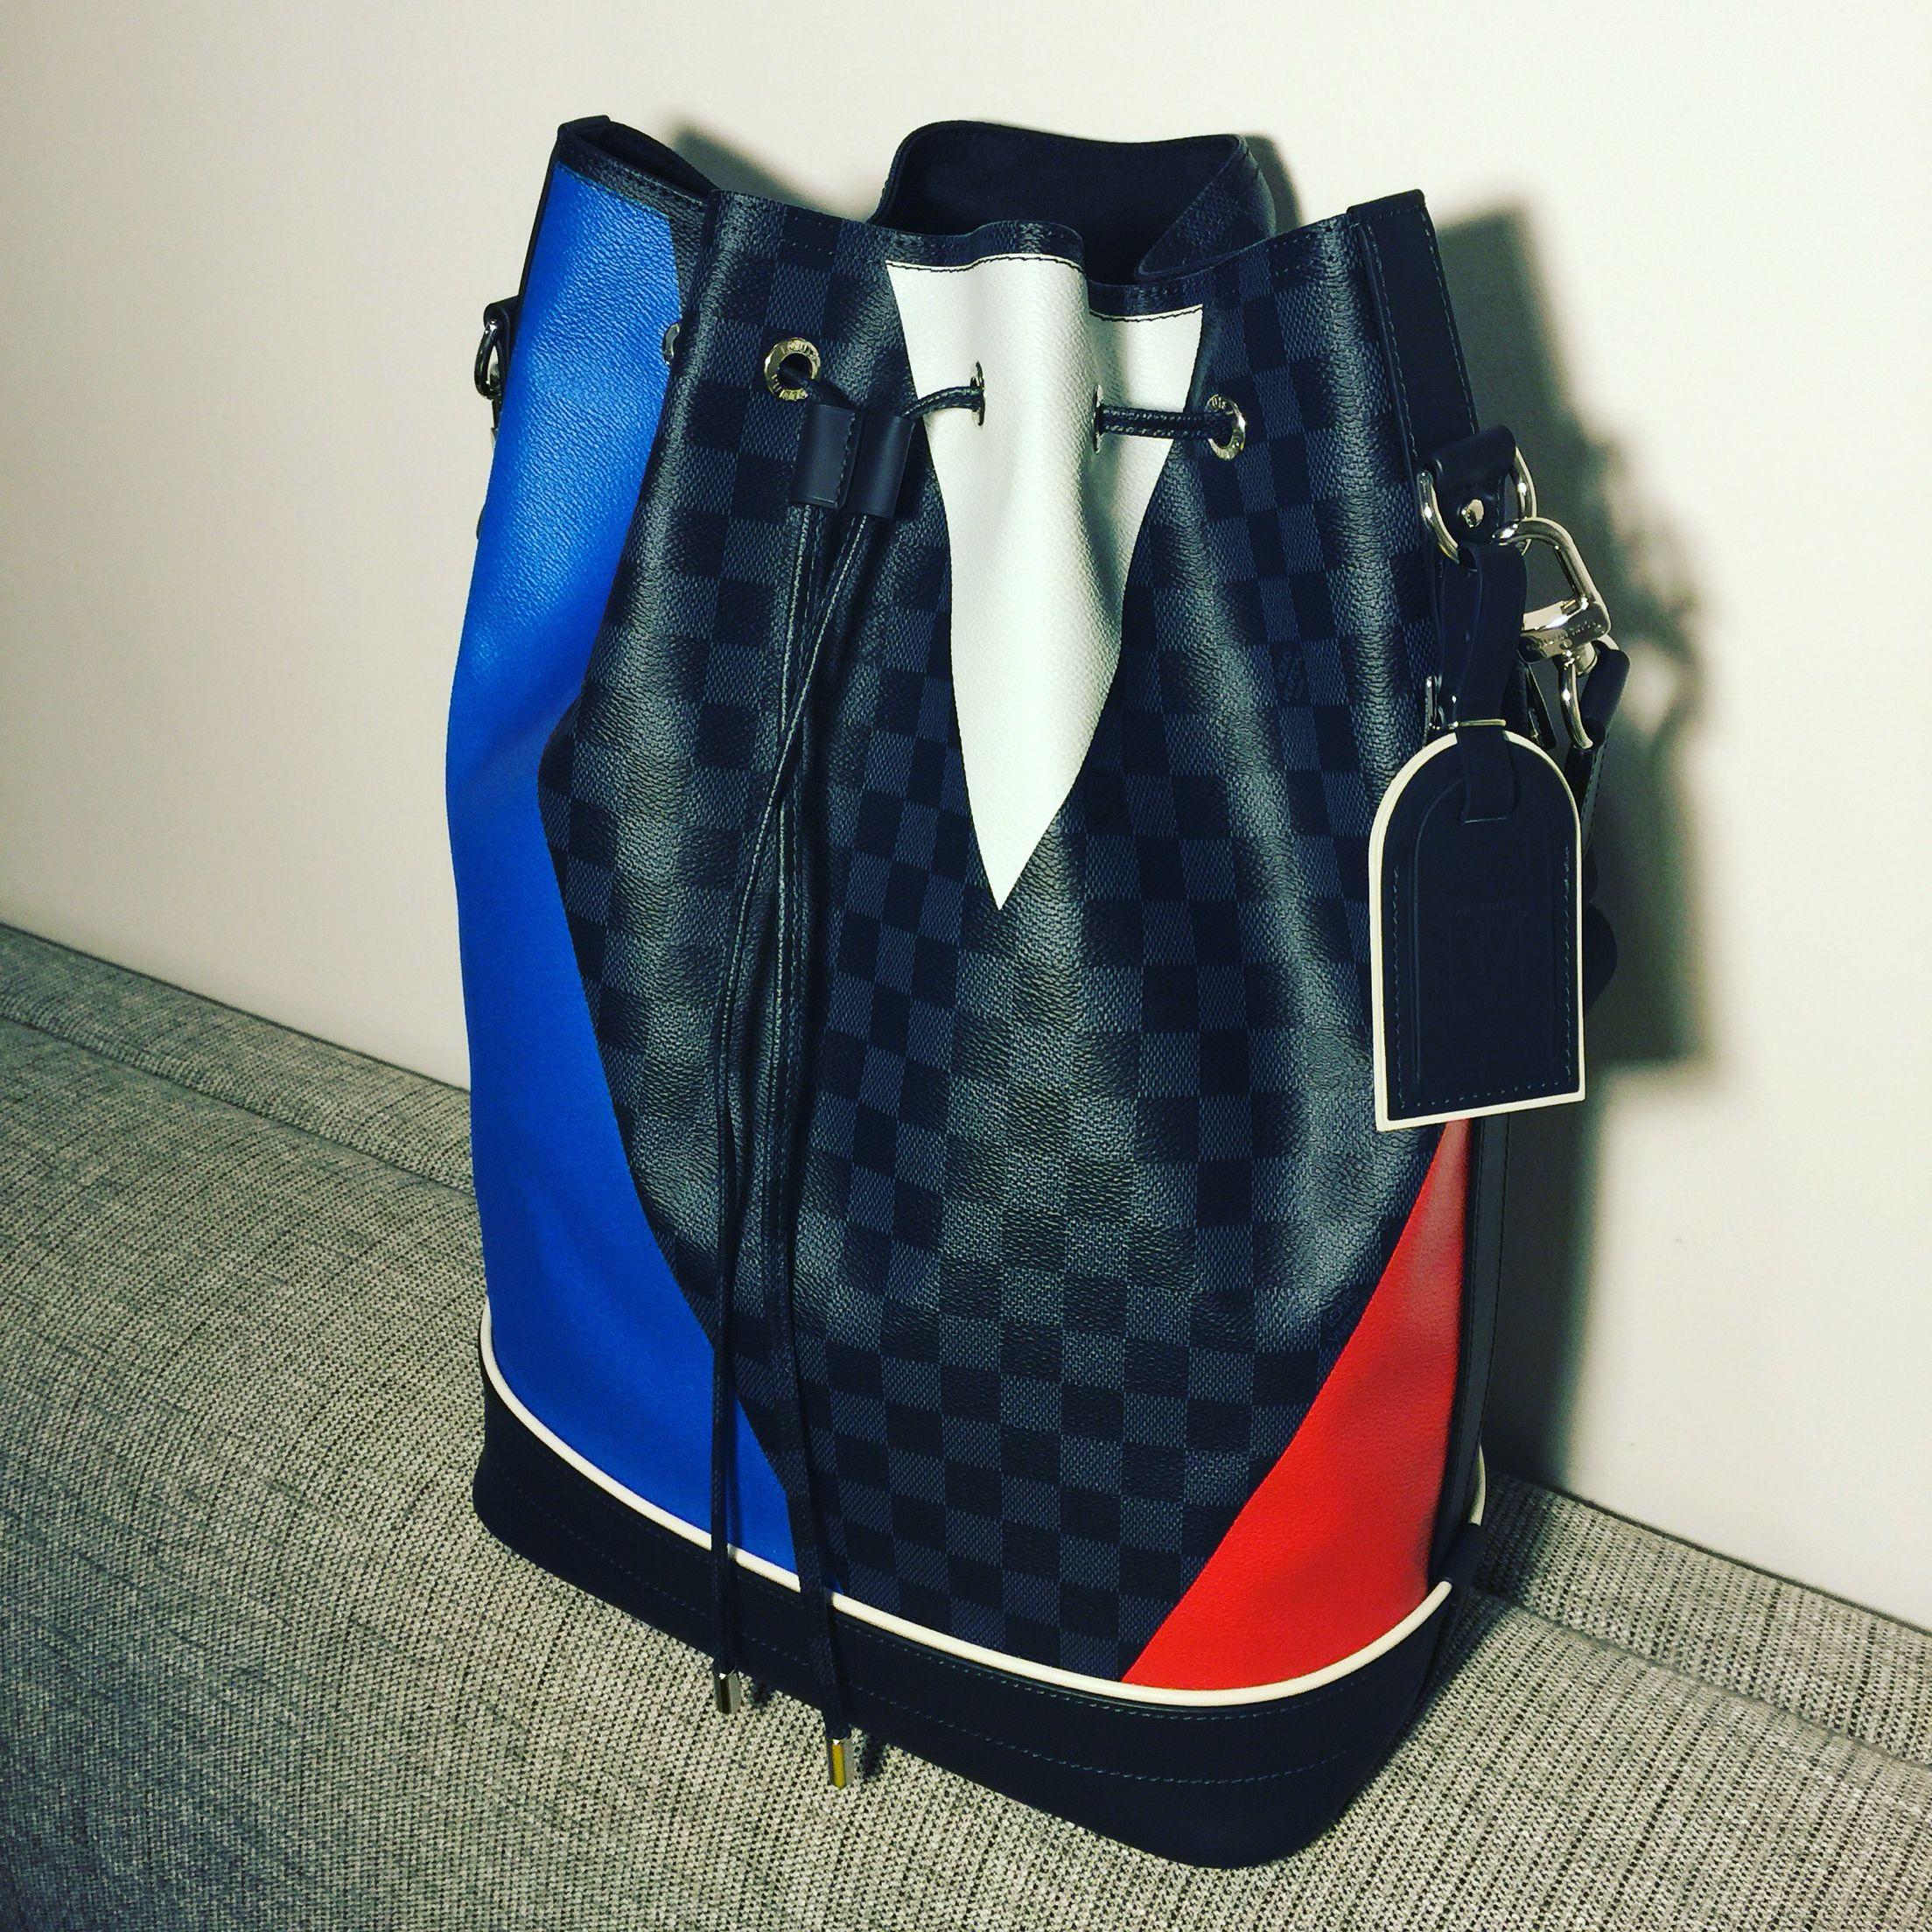 a81fbe695d8a Noé Marin bag in Damier Cobalt Regatta canvas for America Cup 2016 by Louis  Vuitton.